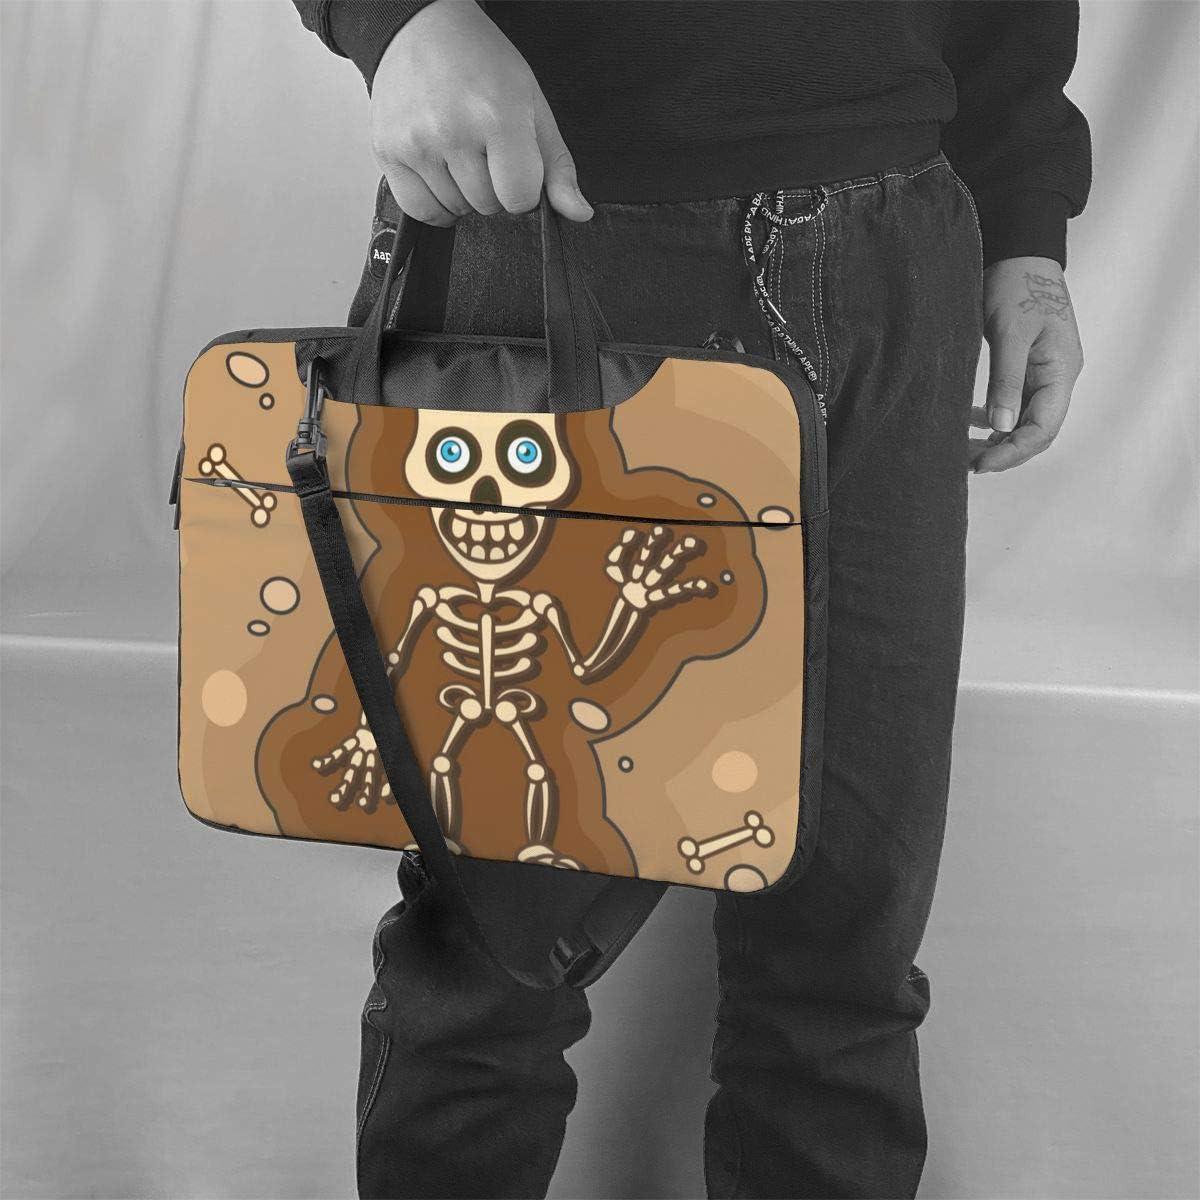 Skeleton Clown Laptop Case,Fashion MacBook Shoulder Bag,Compatible Briefcase Sleeve with Removable Belt Versatile Canvas Notebook Sleeve with 2 Outer Pocket 15.6 Inch